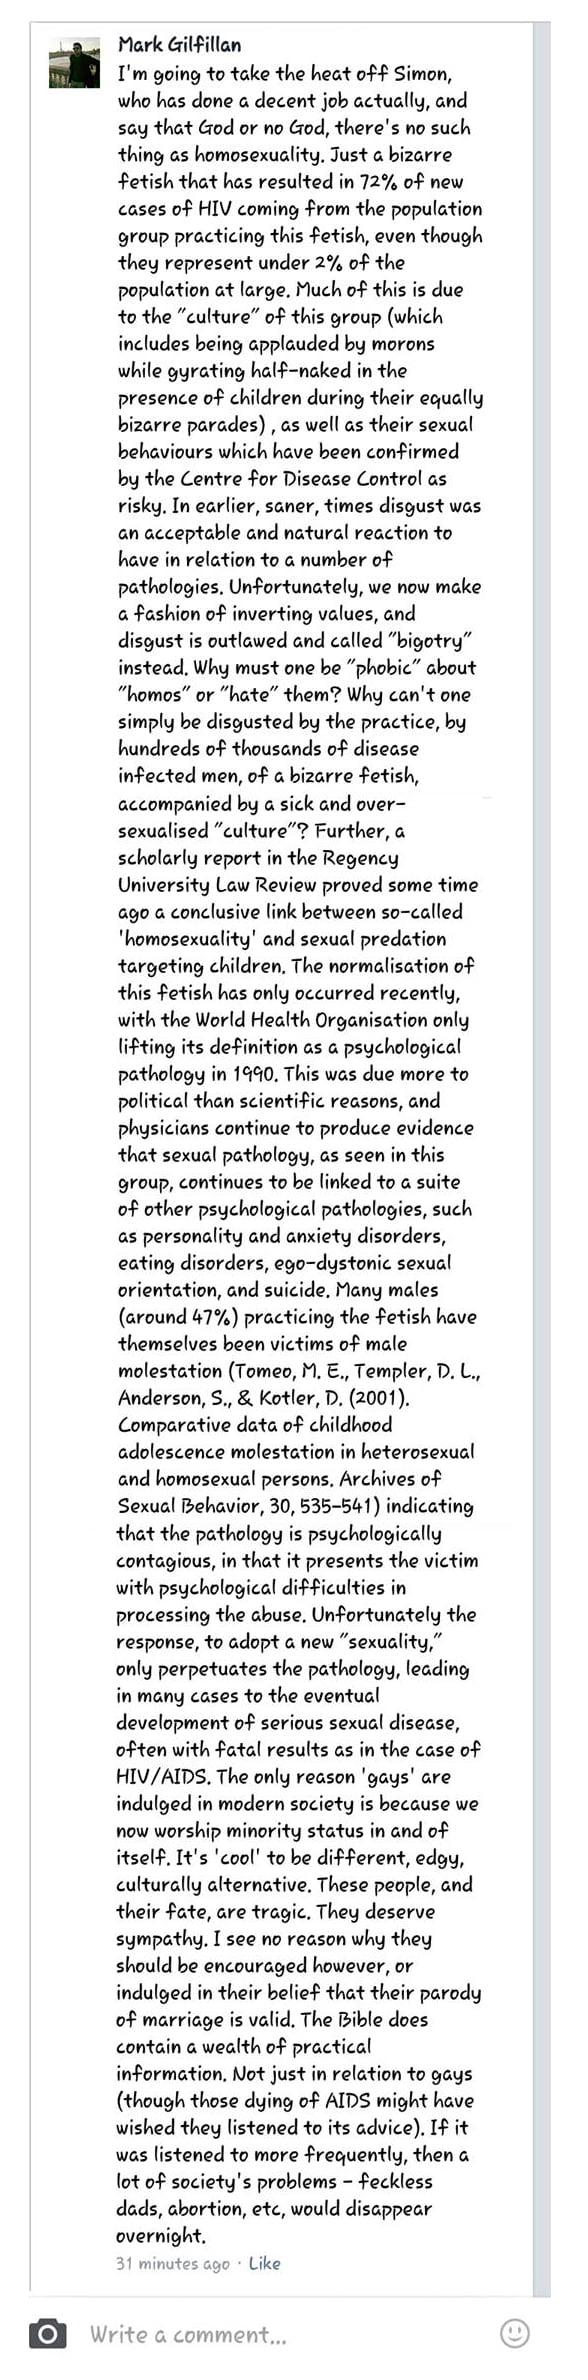 university of ulster coleraine homophobic university research associate